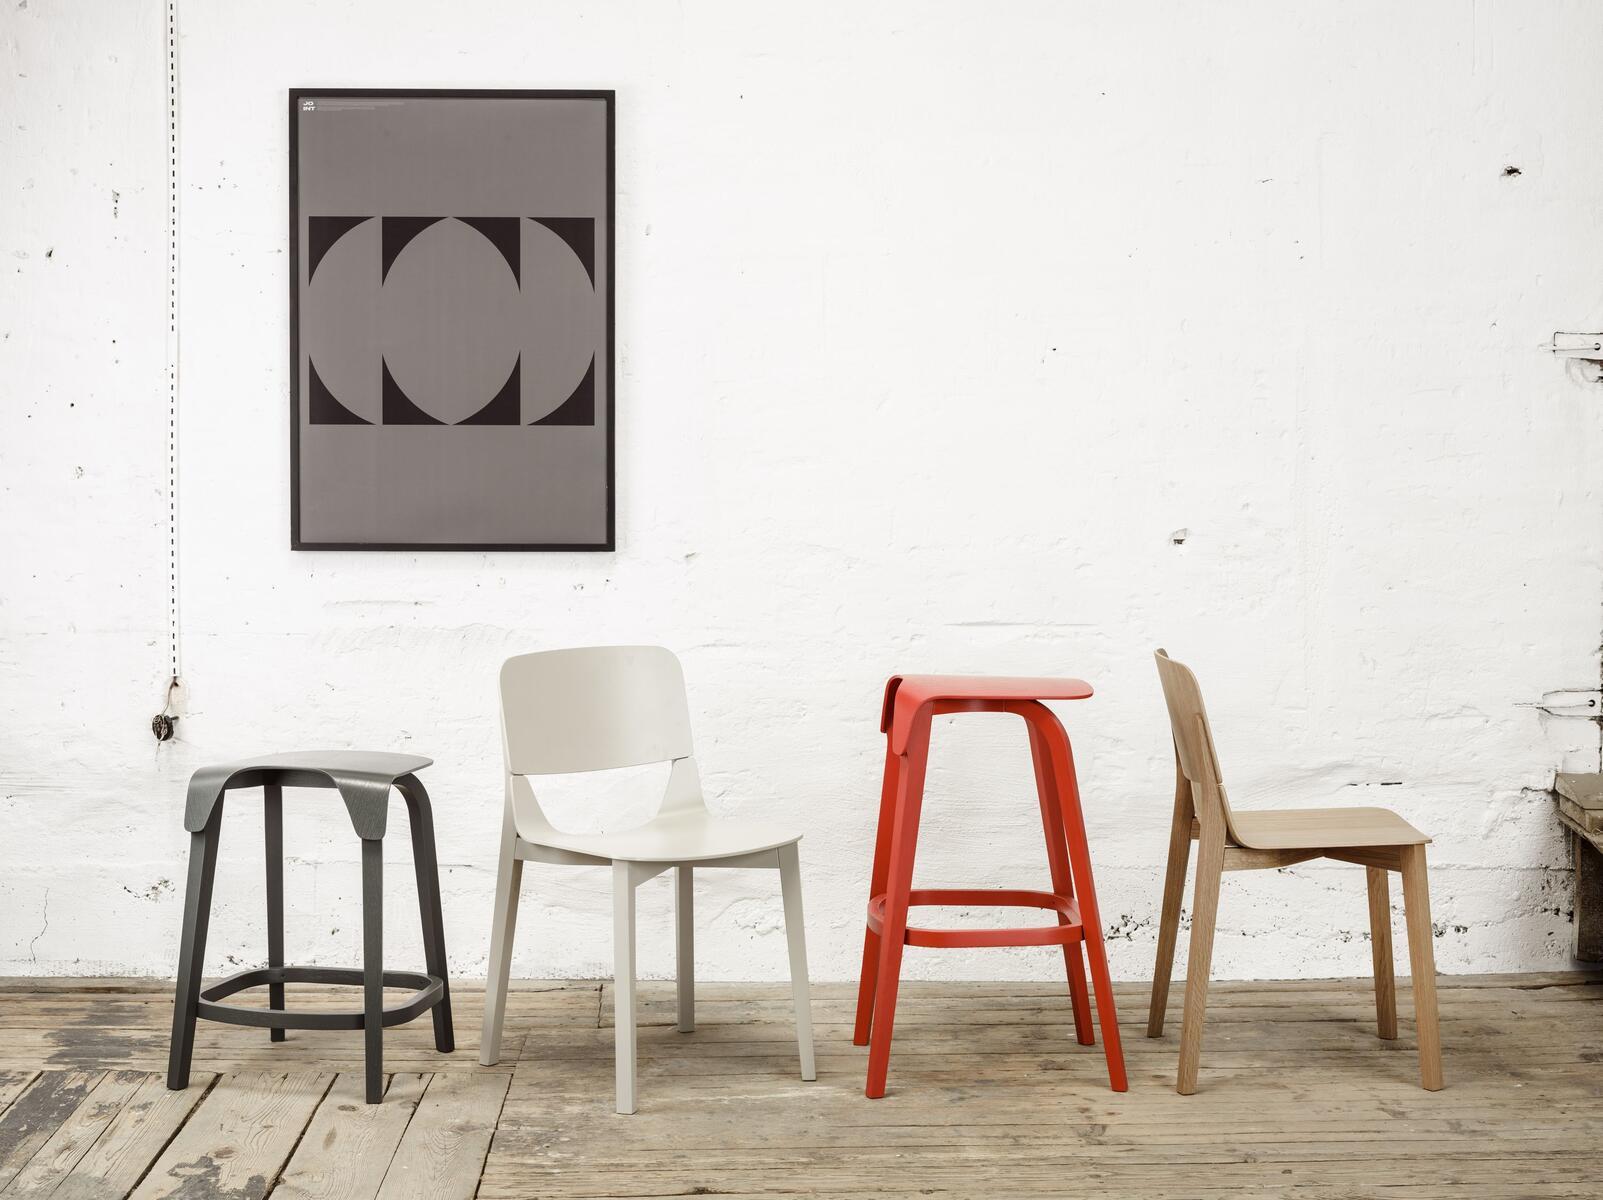 If design award 2017 pro idli a barovou idli leaf ton for Stuhl design award